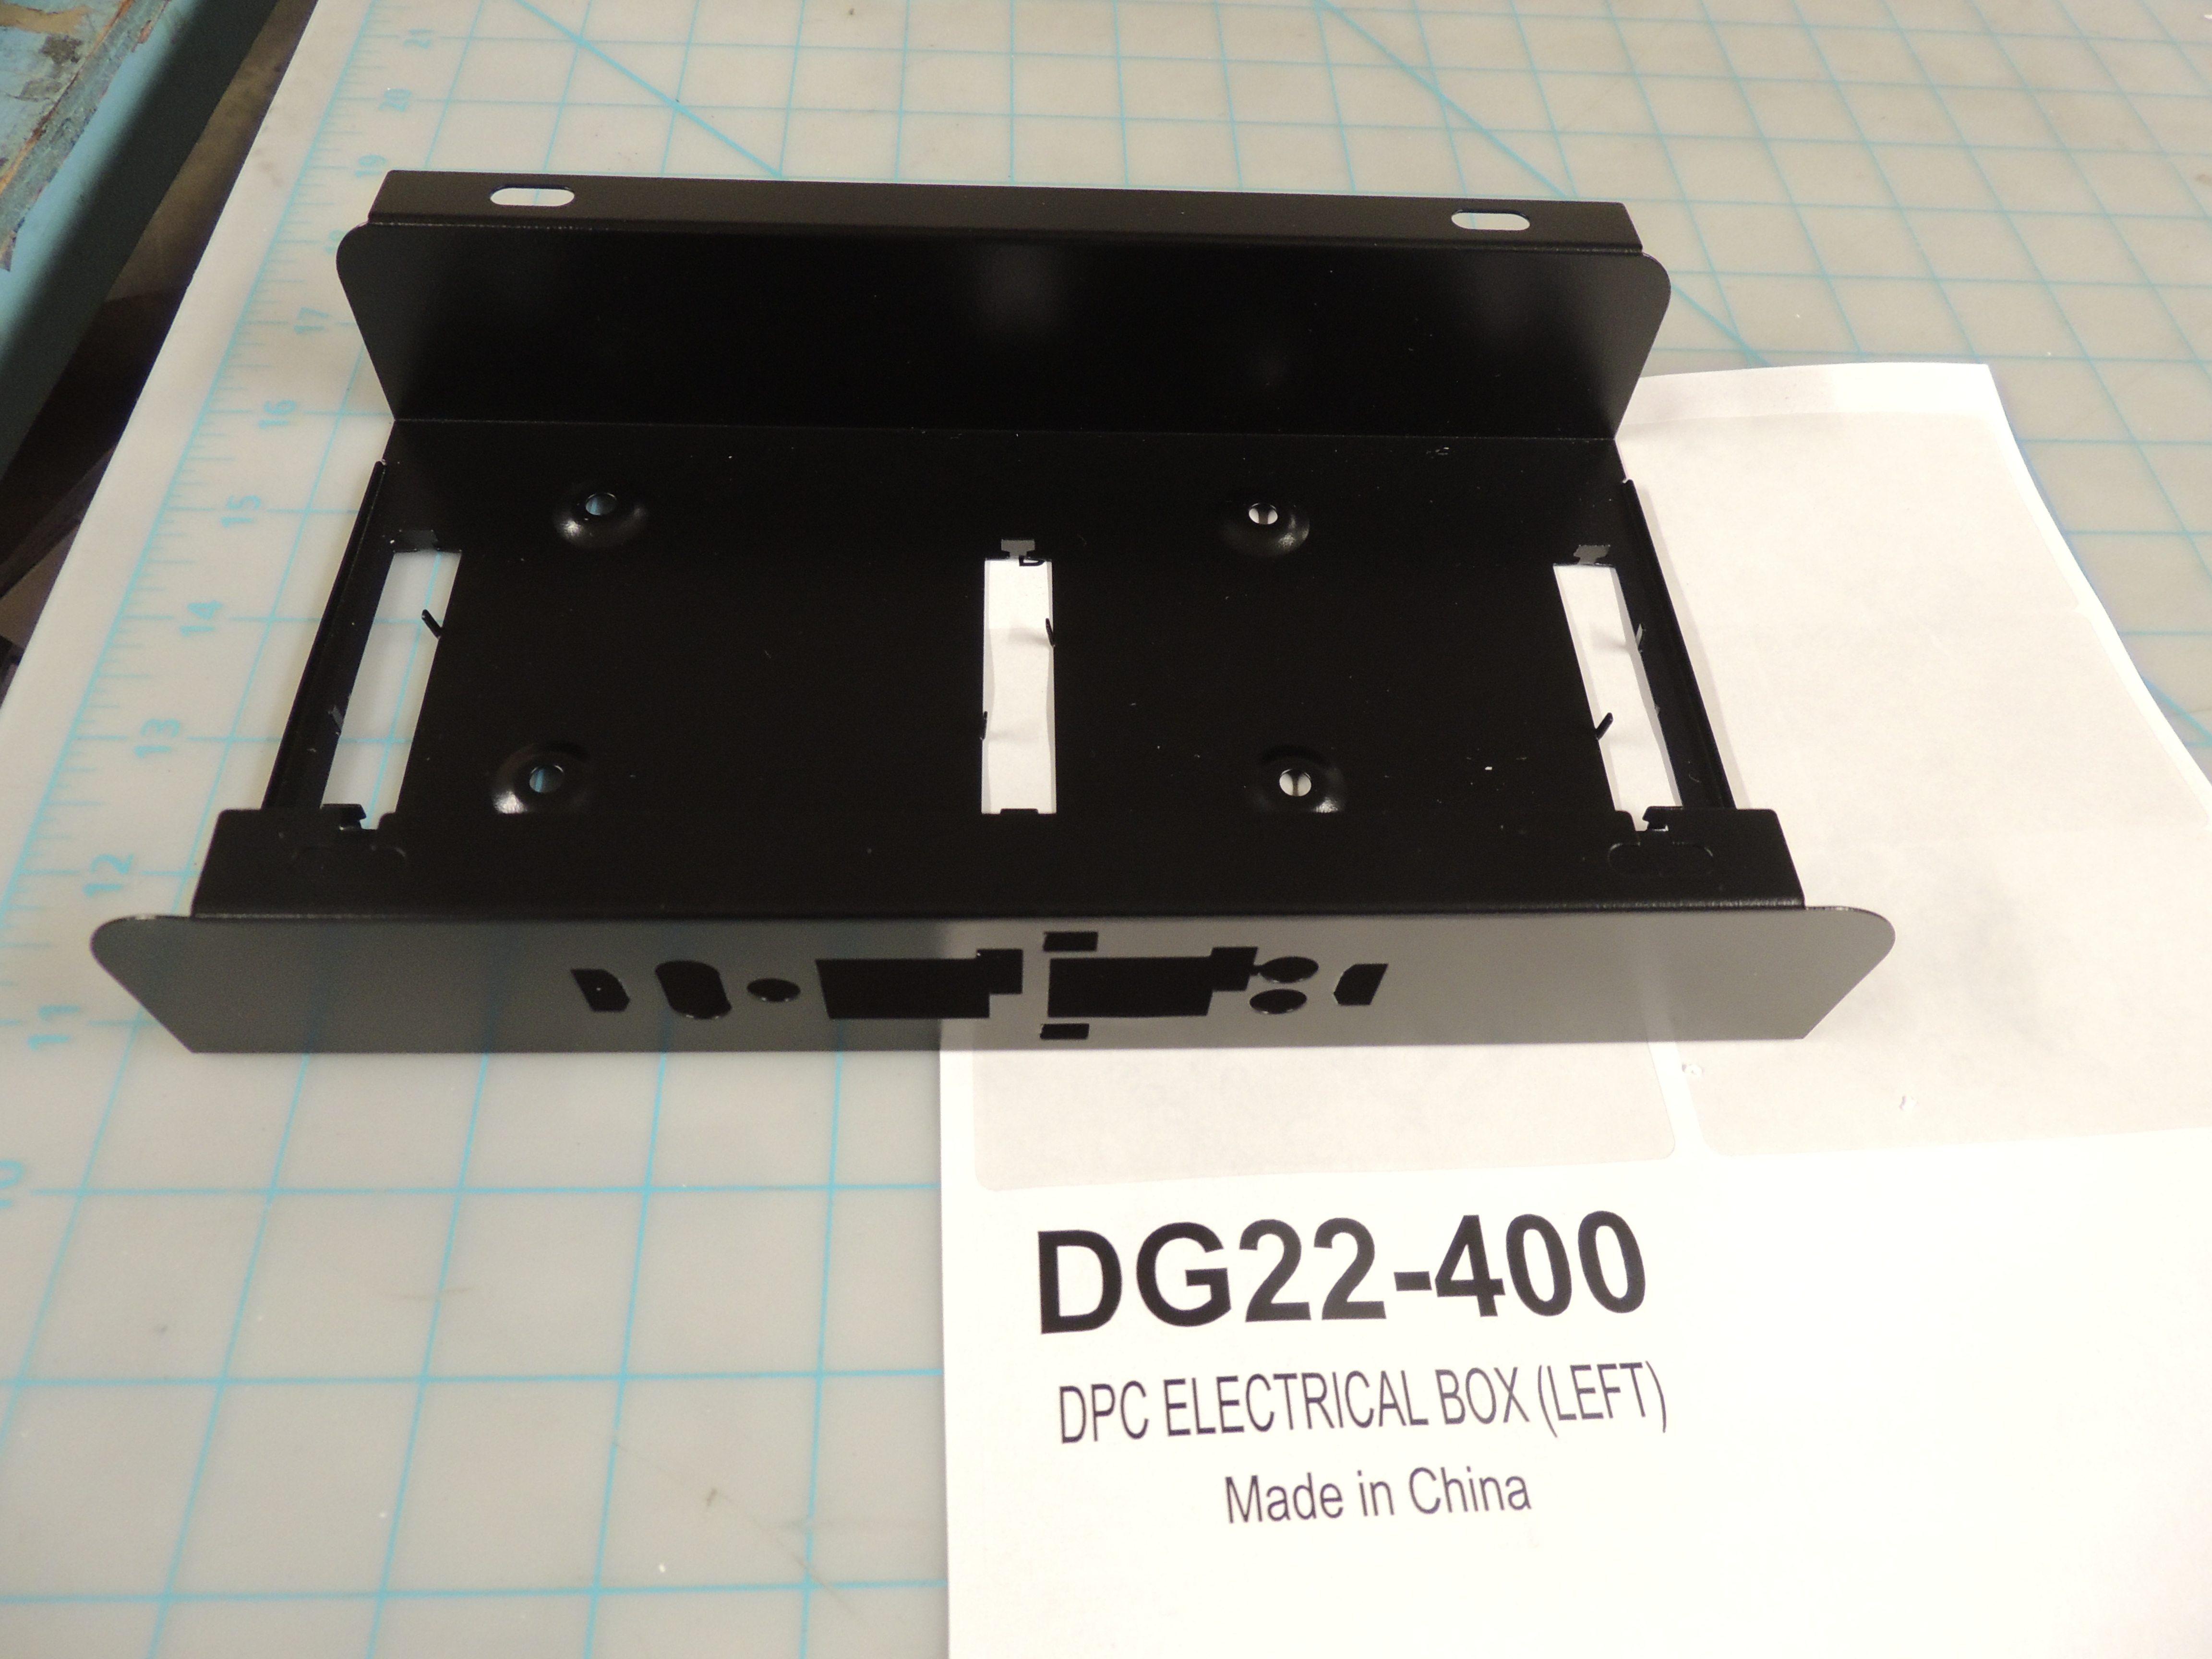 DPC ELECTRICAL BOX (LEFT)